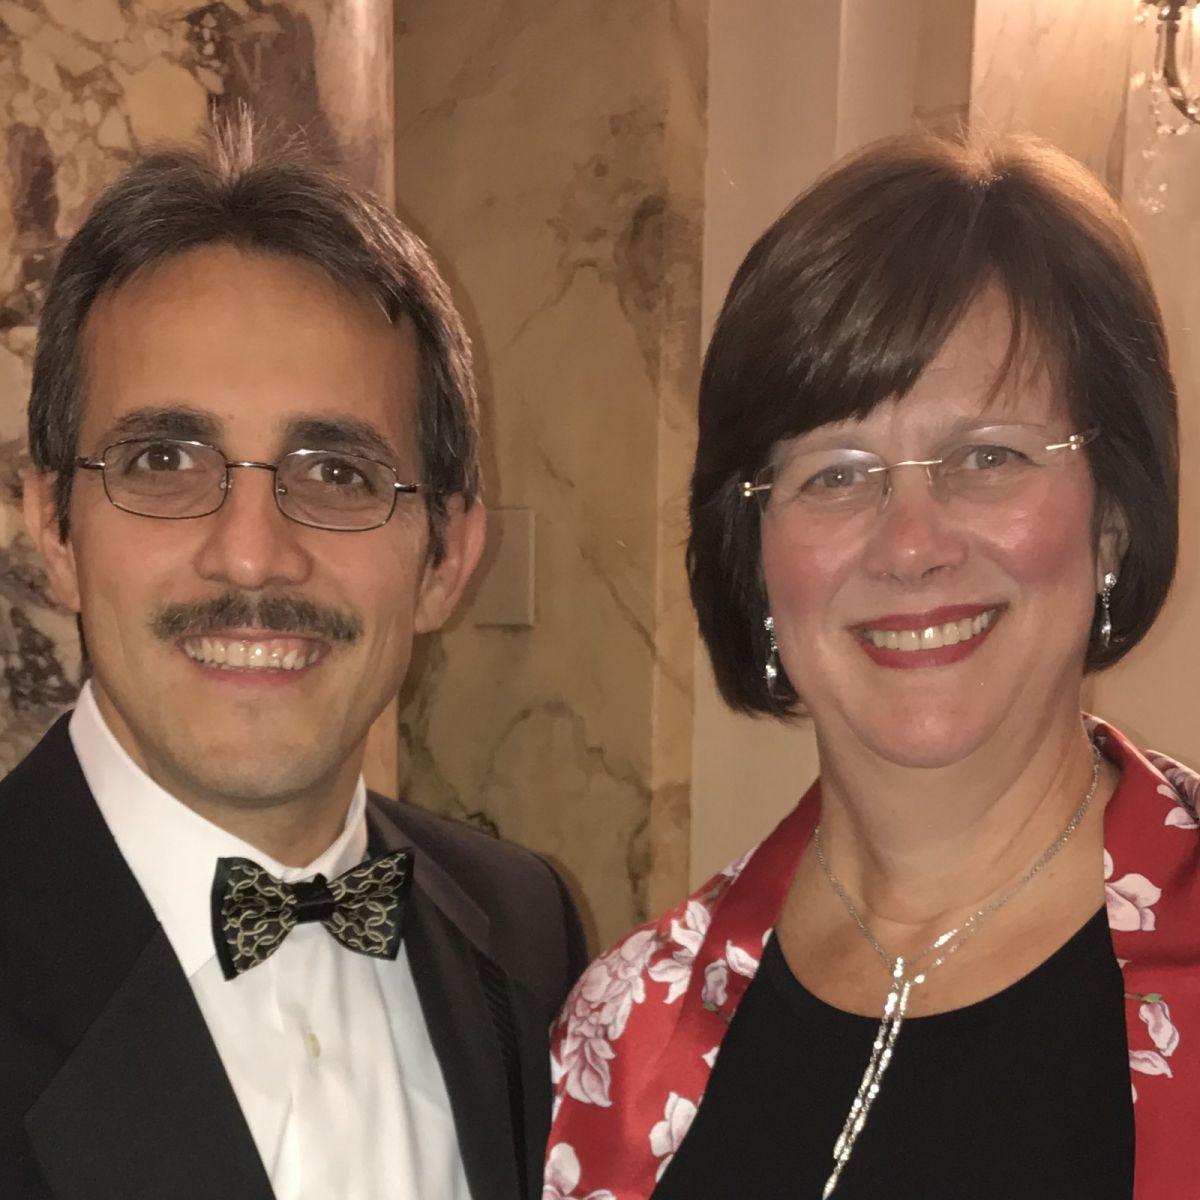 Demetrios G. Vavvas, MD, PhD (R) and Joan Miller, MD (L)